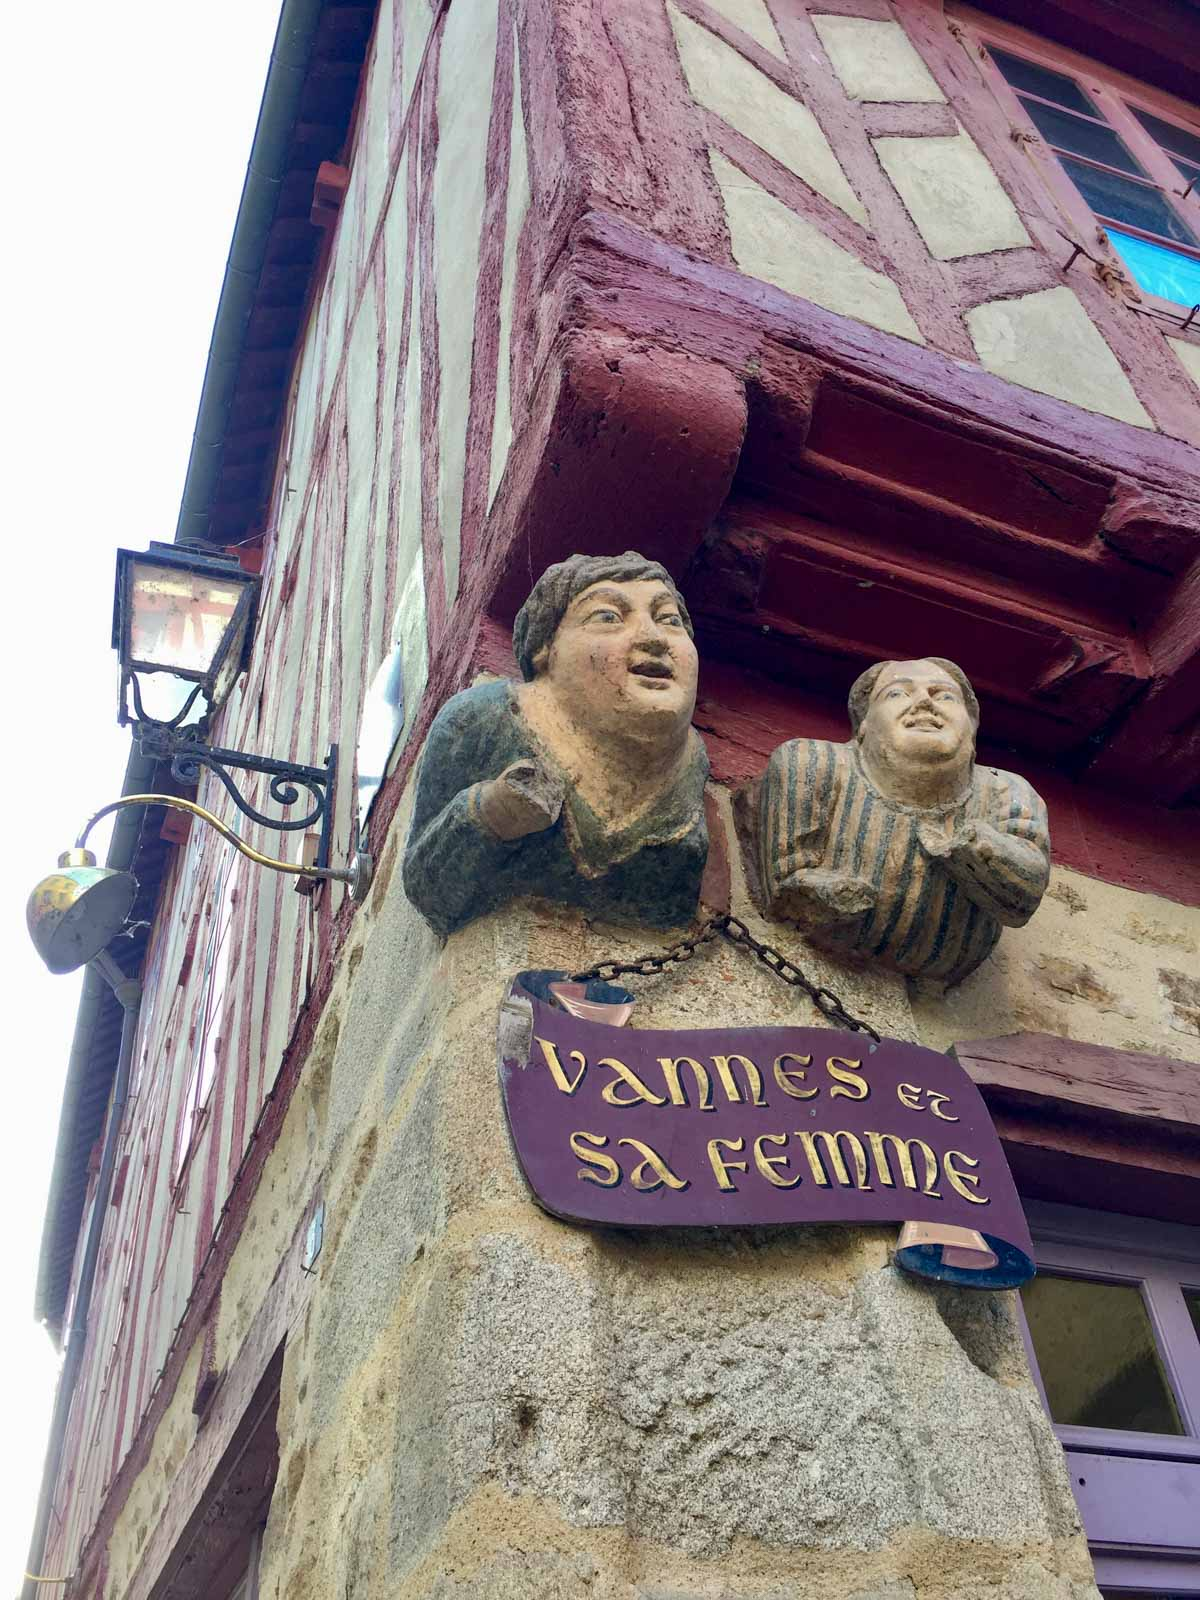 Vannes et sa femme, Vannes, Morbihan, Bretagne